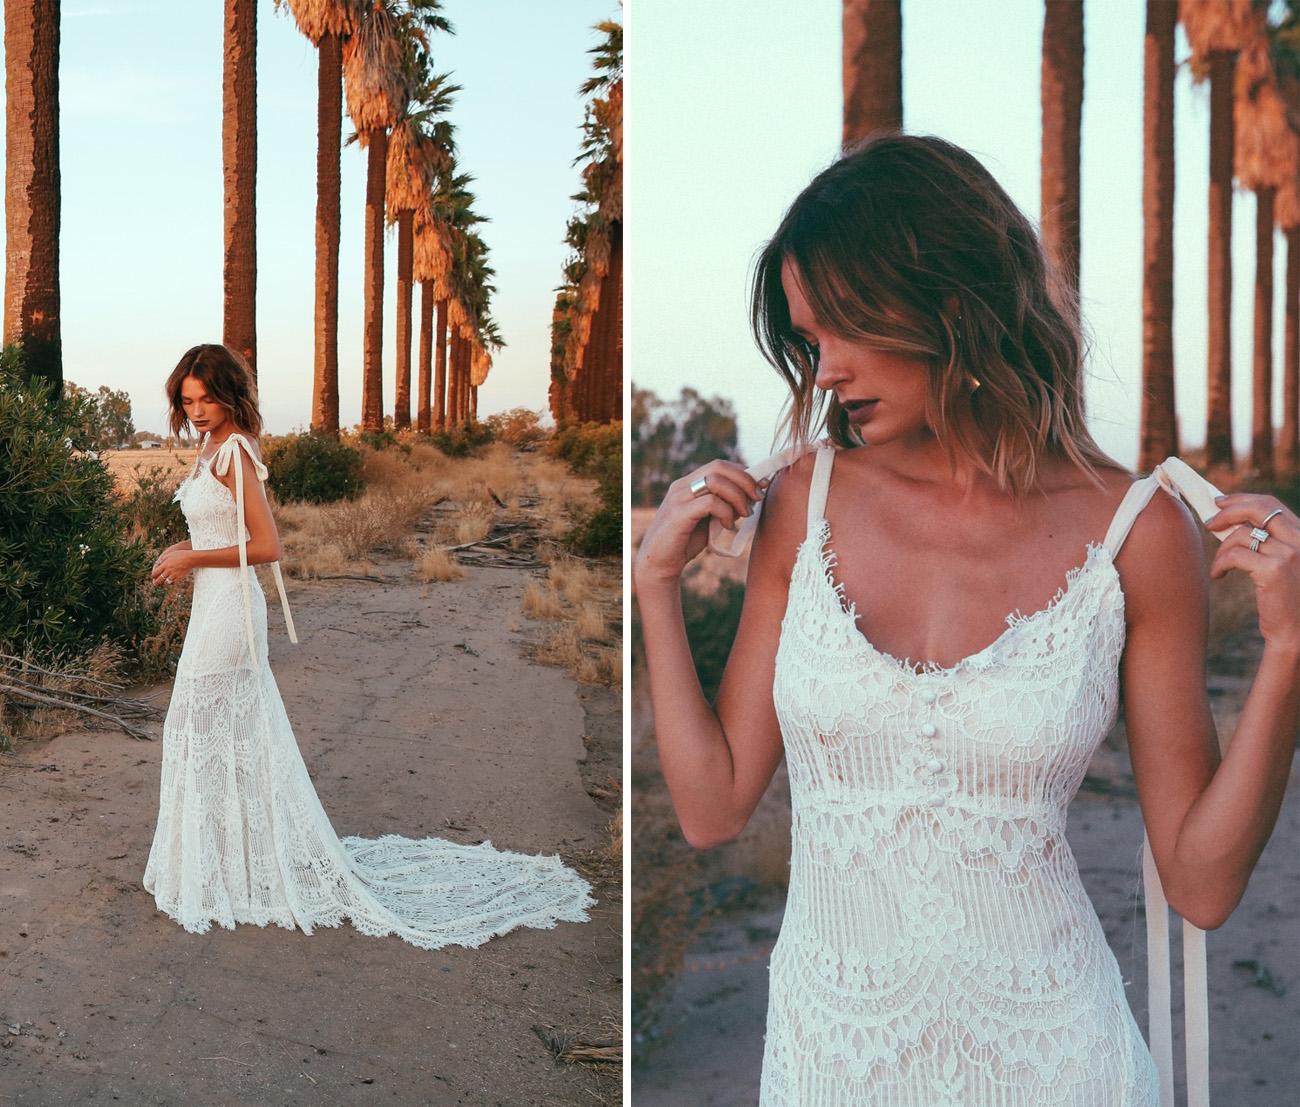 ivory-and-beau-bridal-boutique-zodiac-wedding-style-savannah-wedding-gowns-savannah-wedding-dresses-earnest-loans-21.jpg